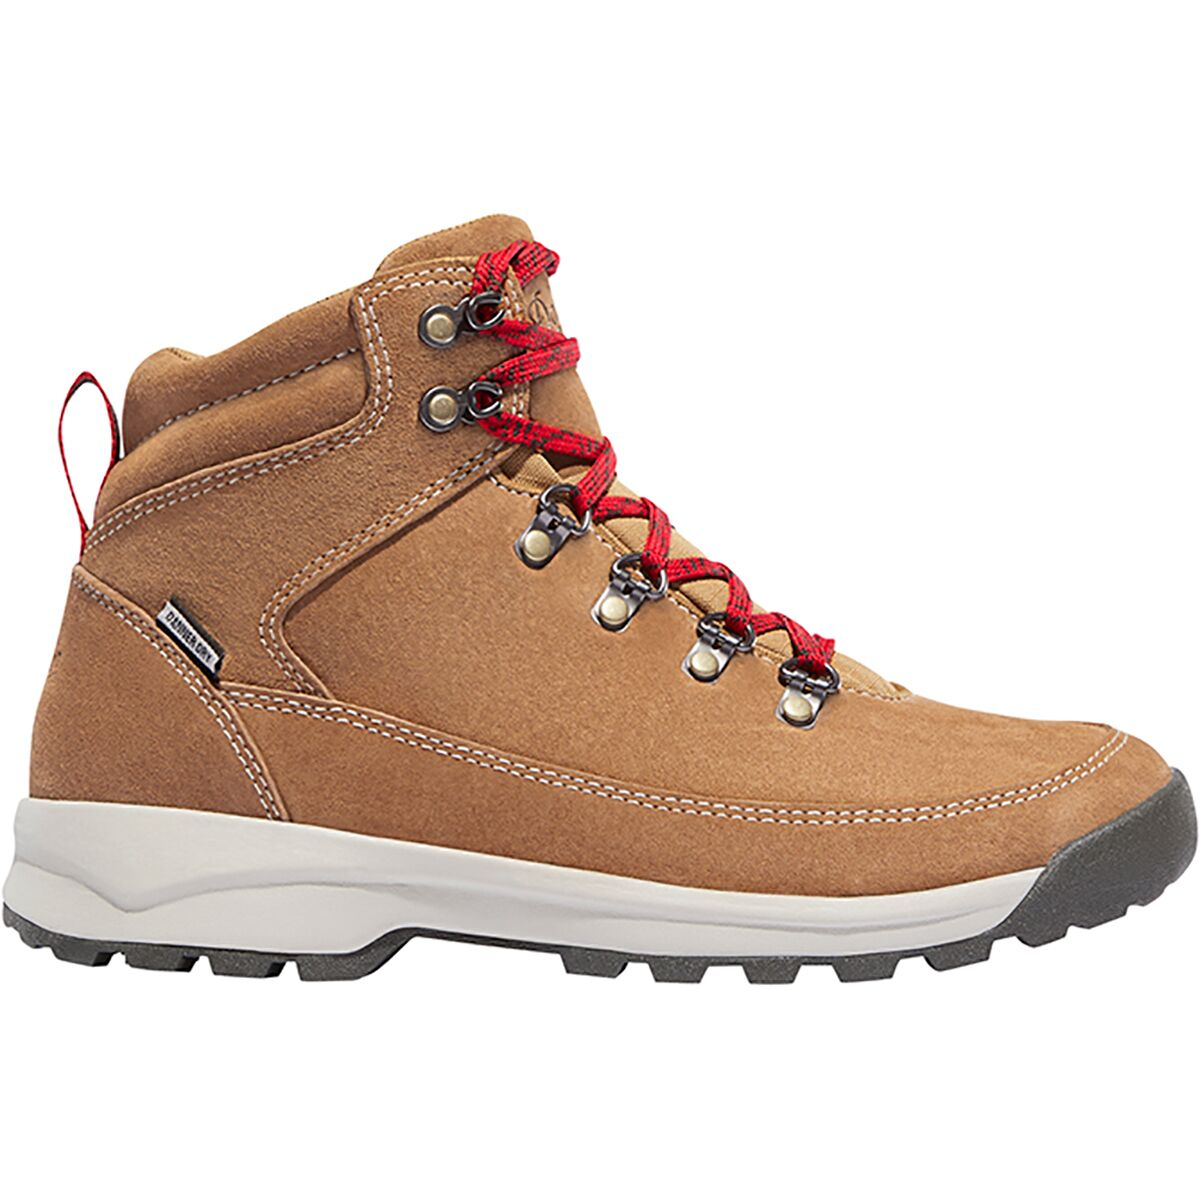 Adrika Hiker Boot - Women